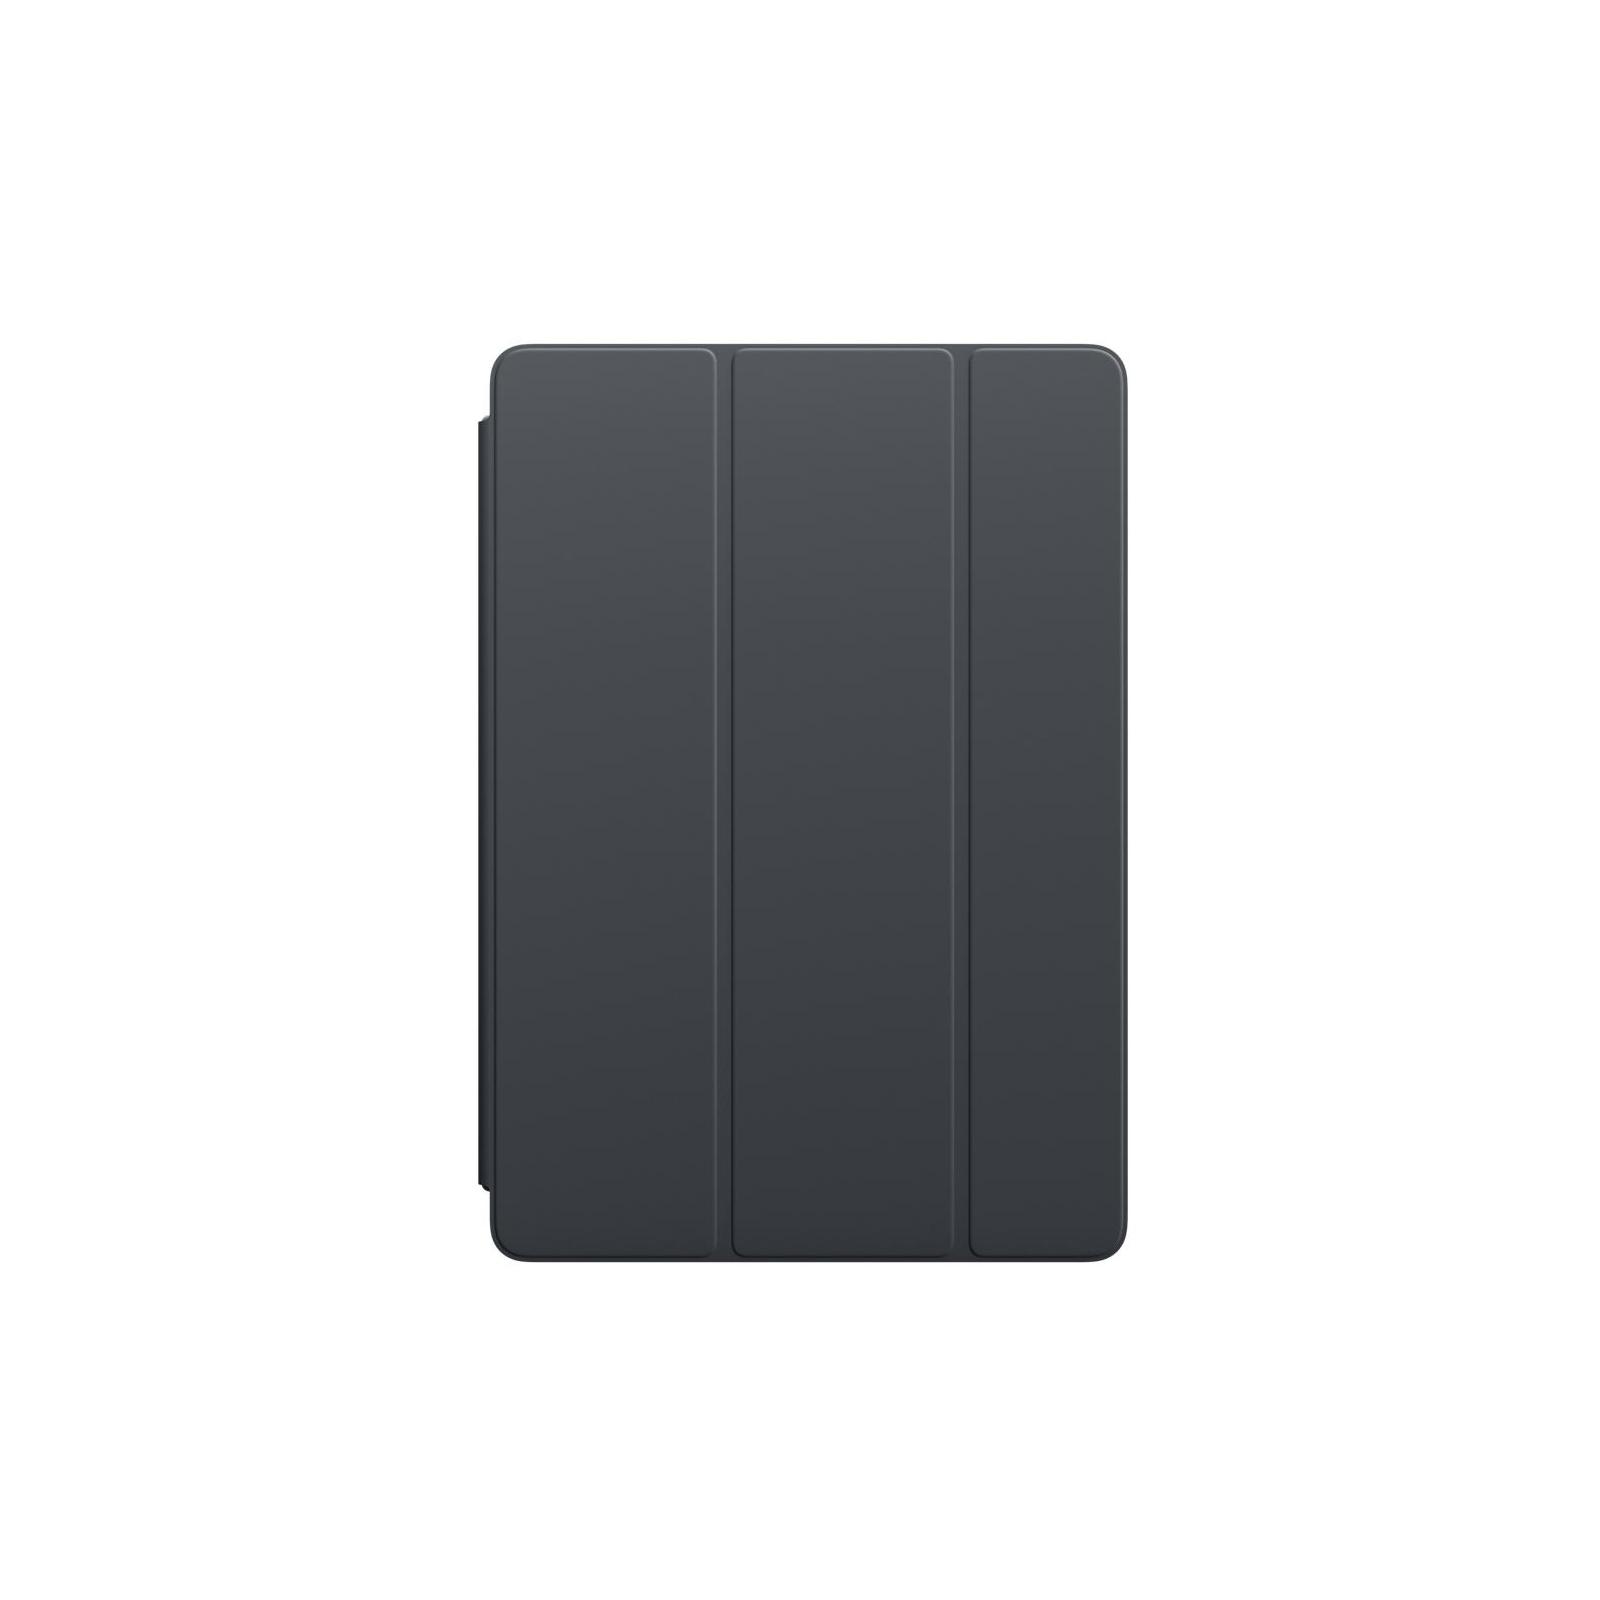 Чехол для планшета Apple Smart Cover for 10.5‑inch iPad Pro - Charcoal Gray (MQ082ZM/A)